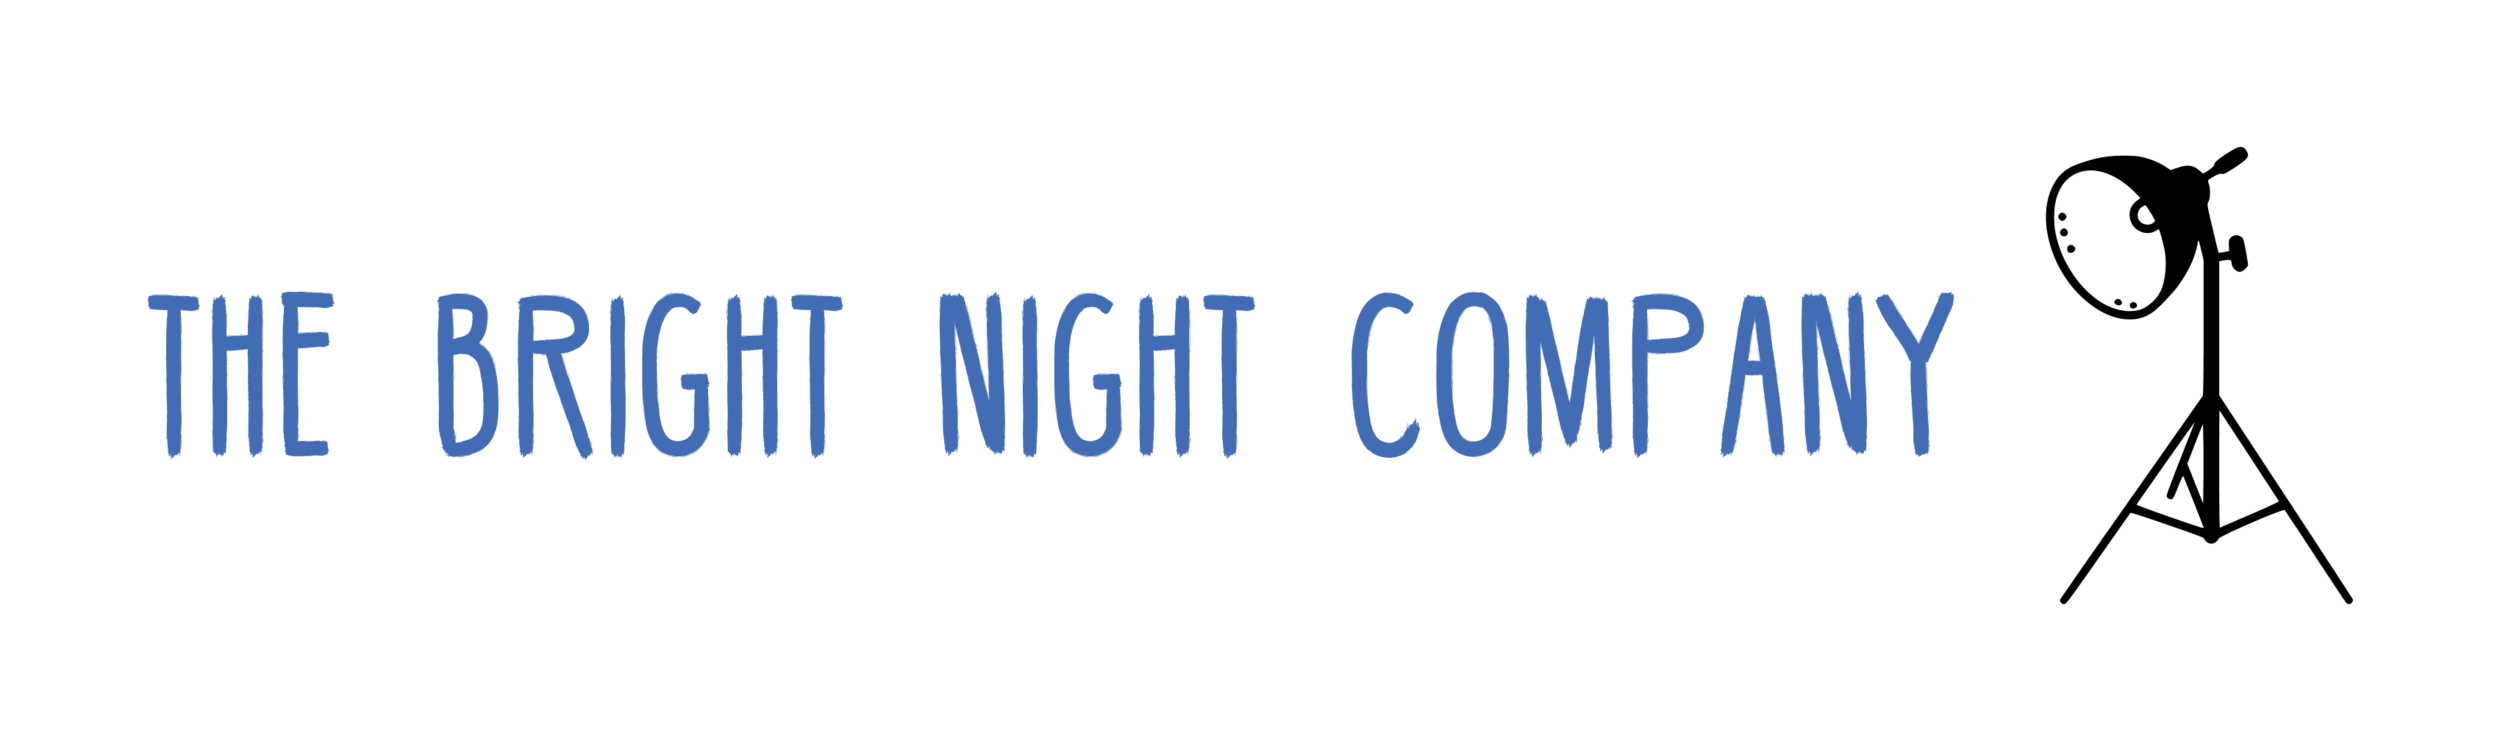 The Bright Night Company